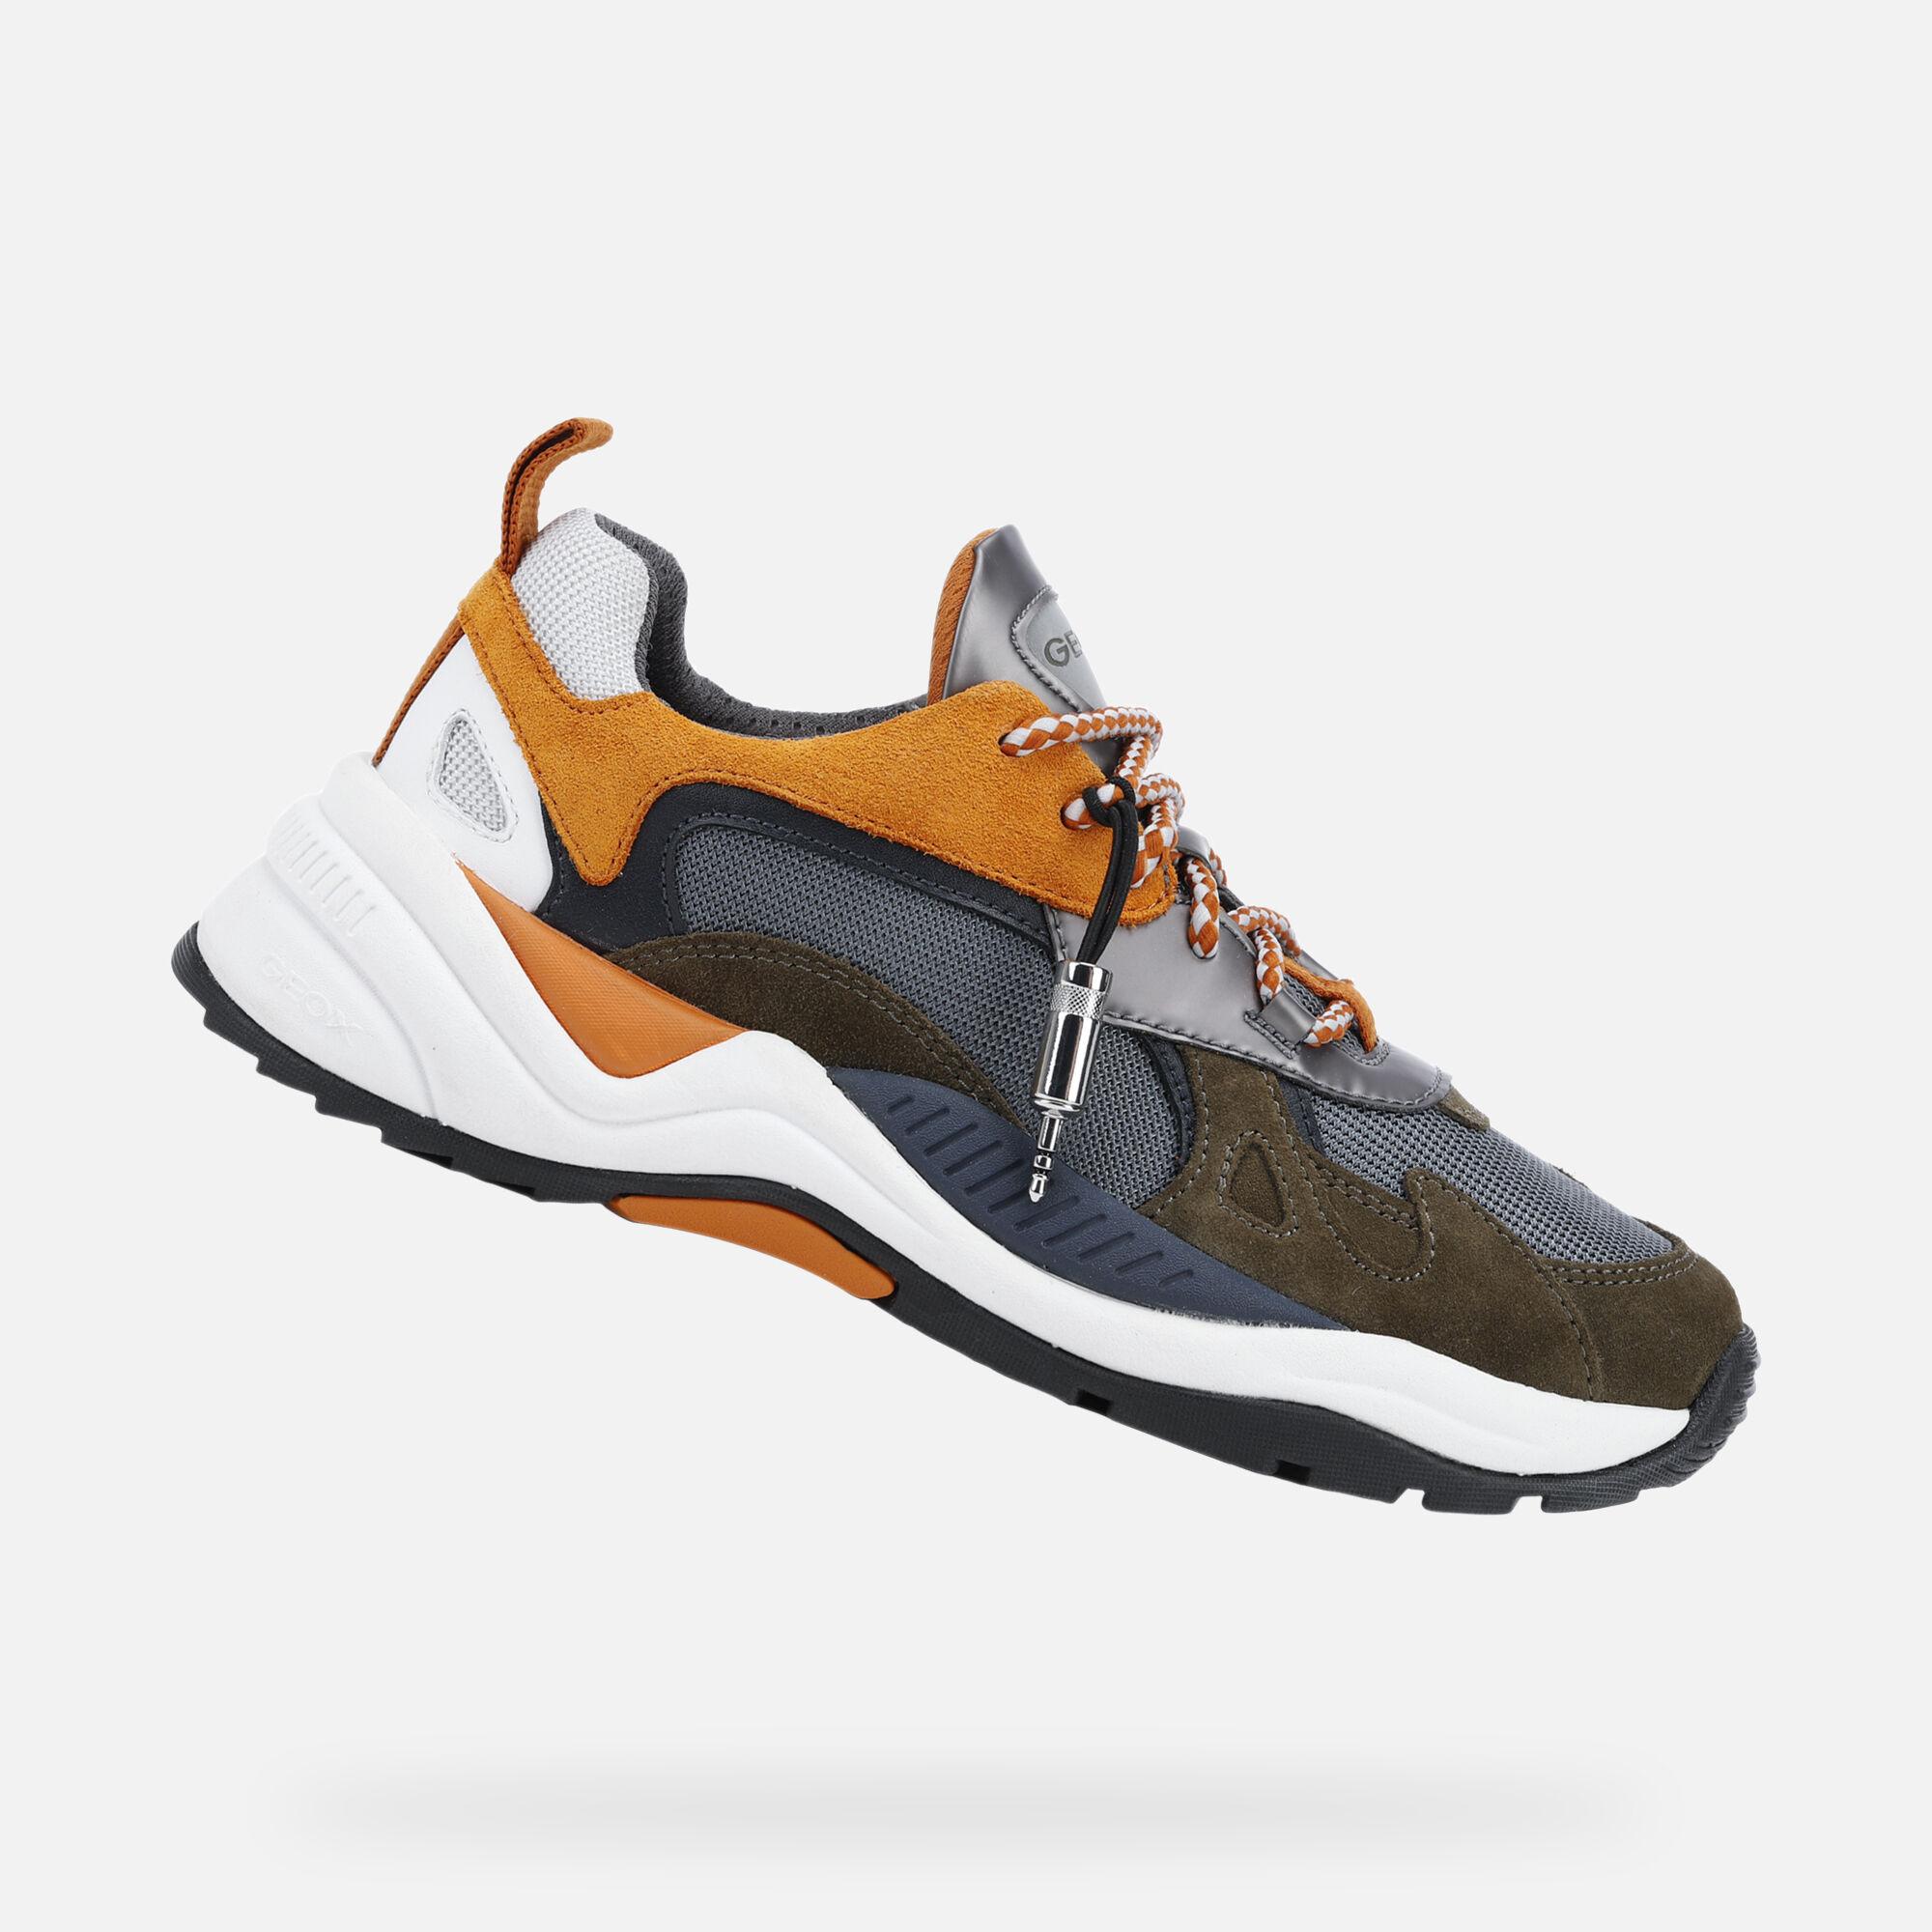 zapatos salomon costa rica yahoo